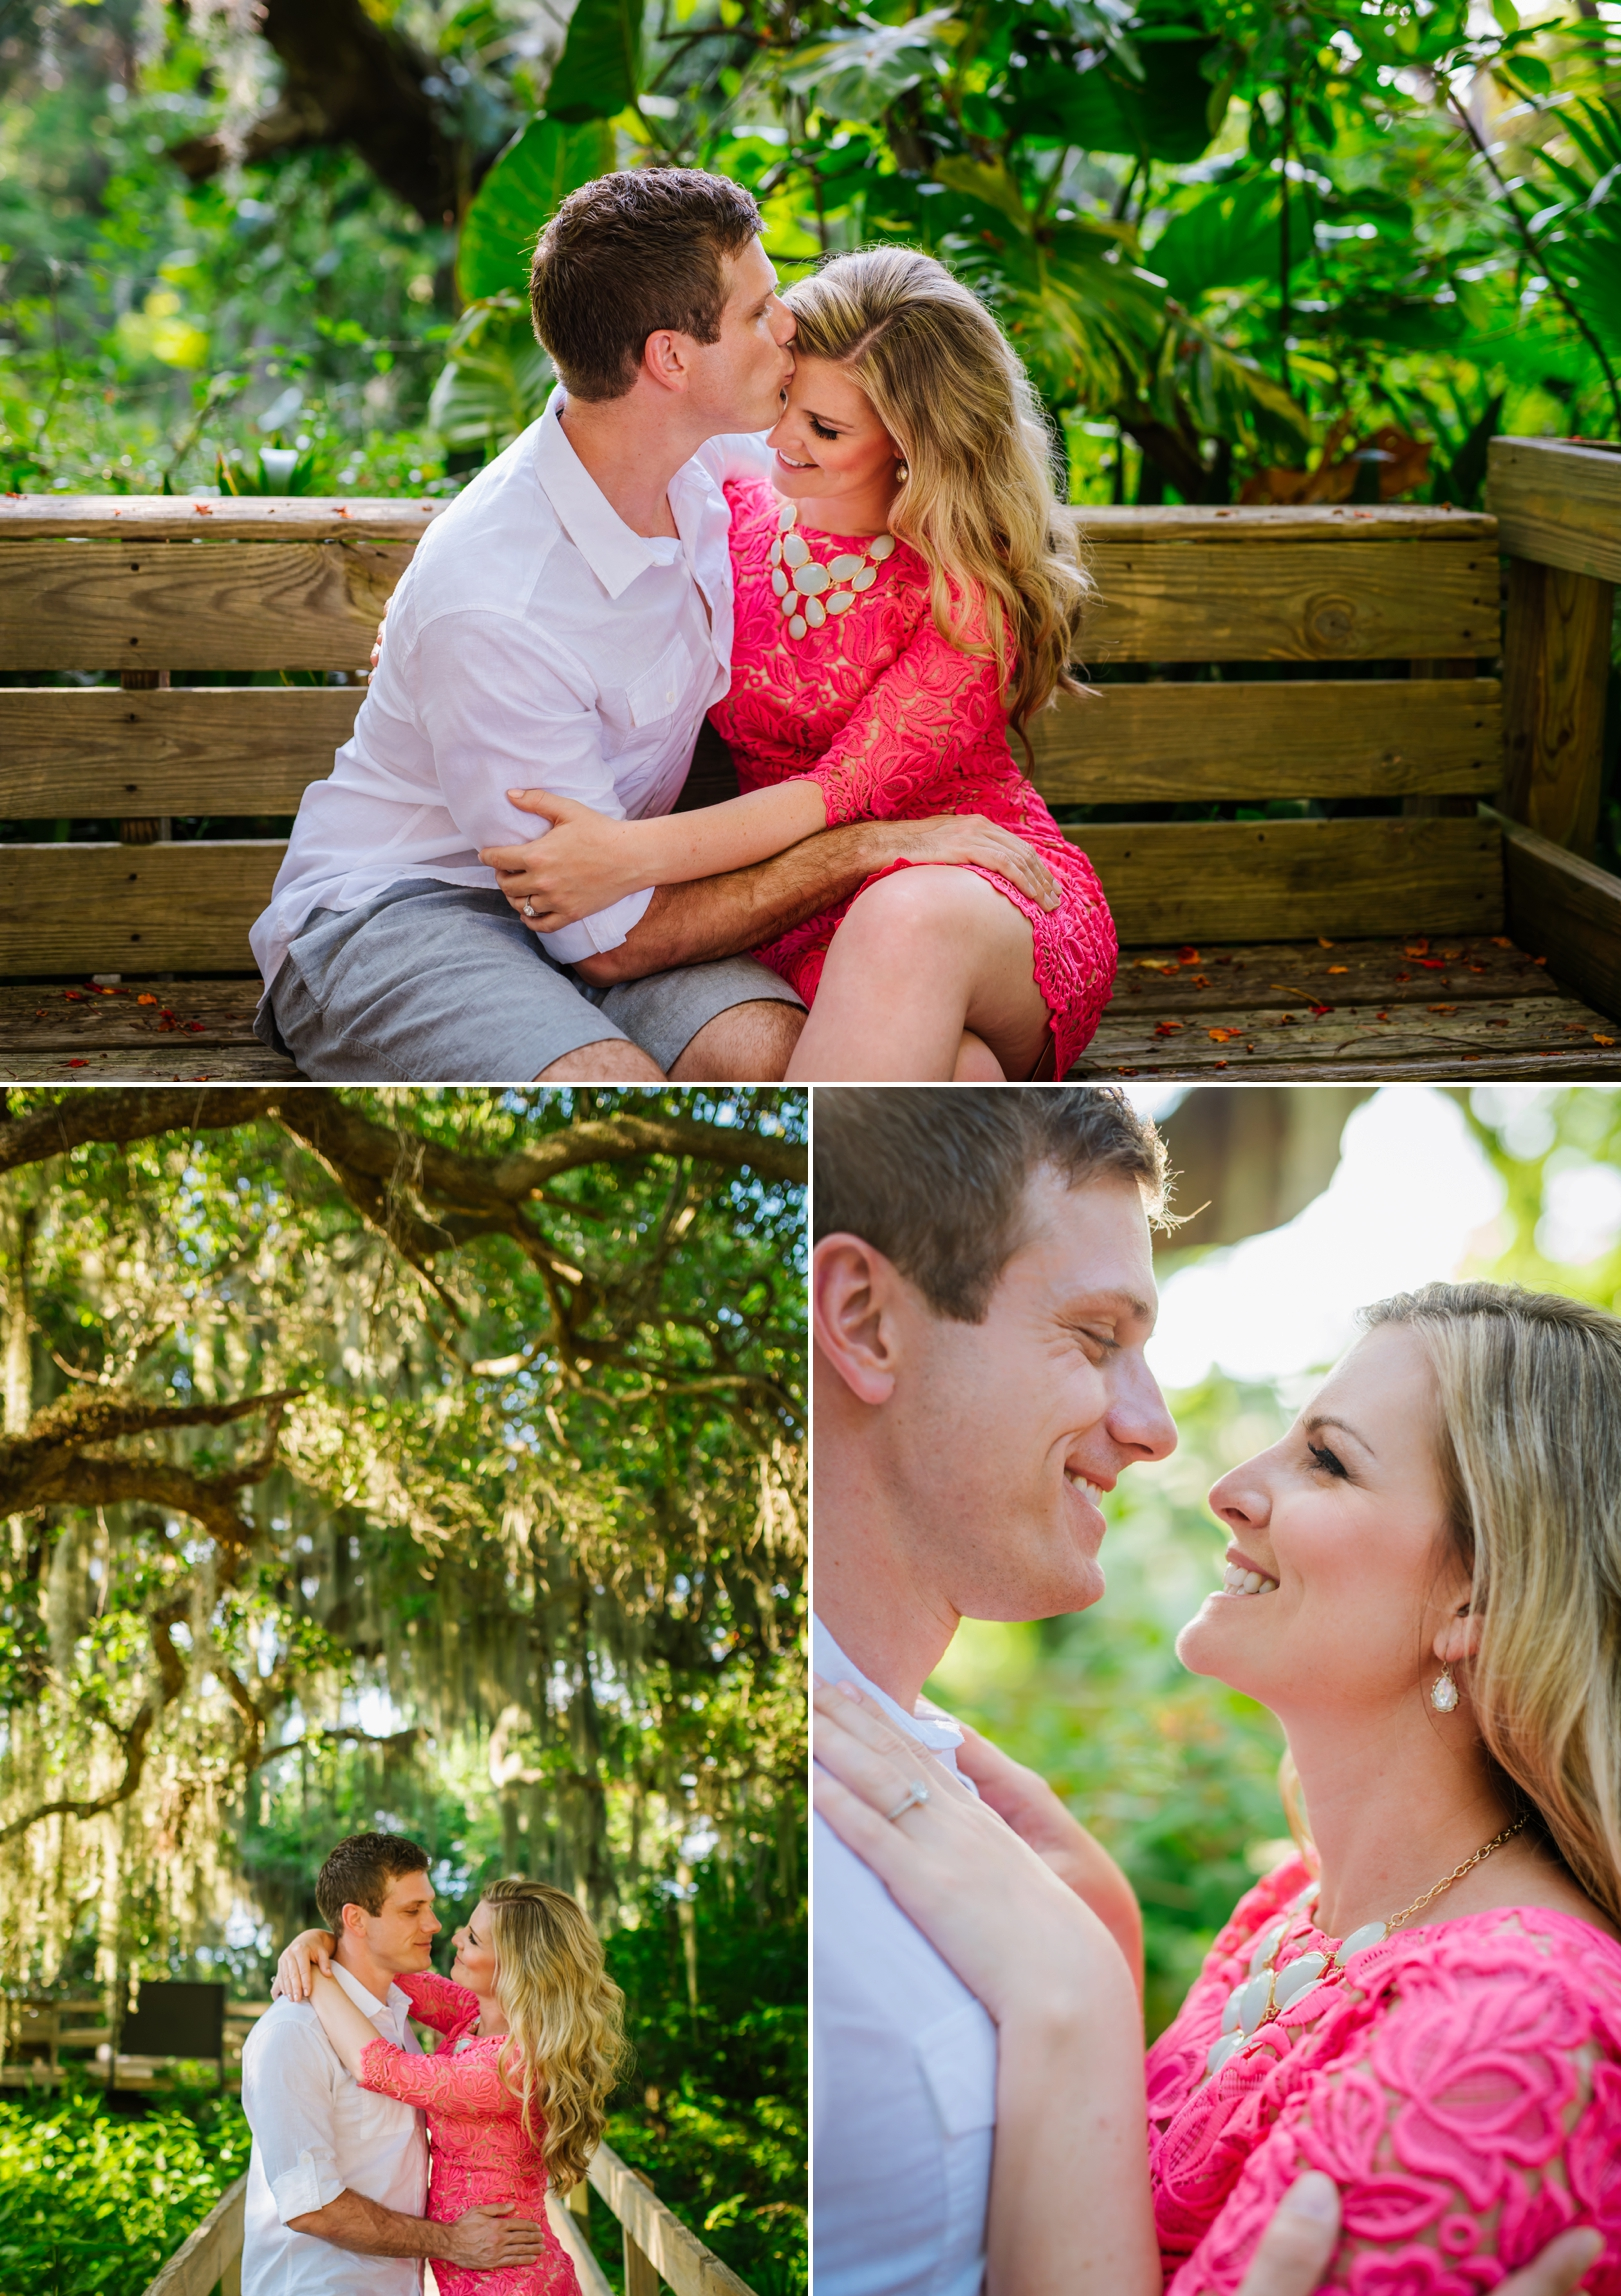 tampa-wedding-photographer-engagement-nature-outdoor-florida_0004.jpg